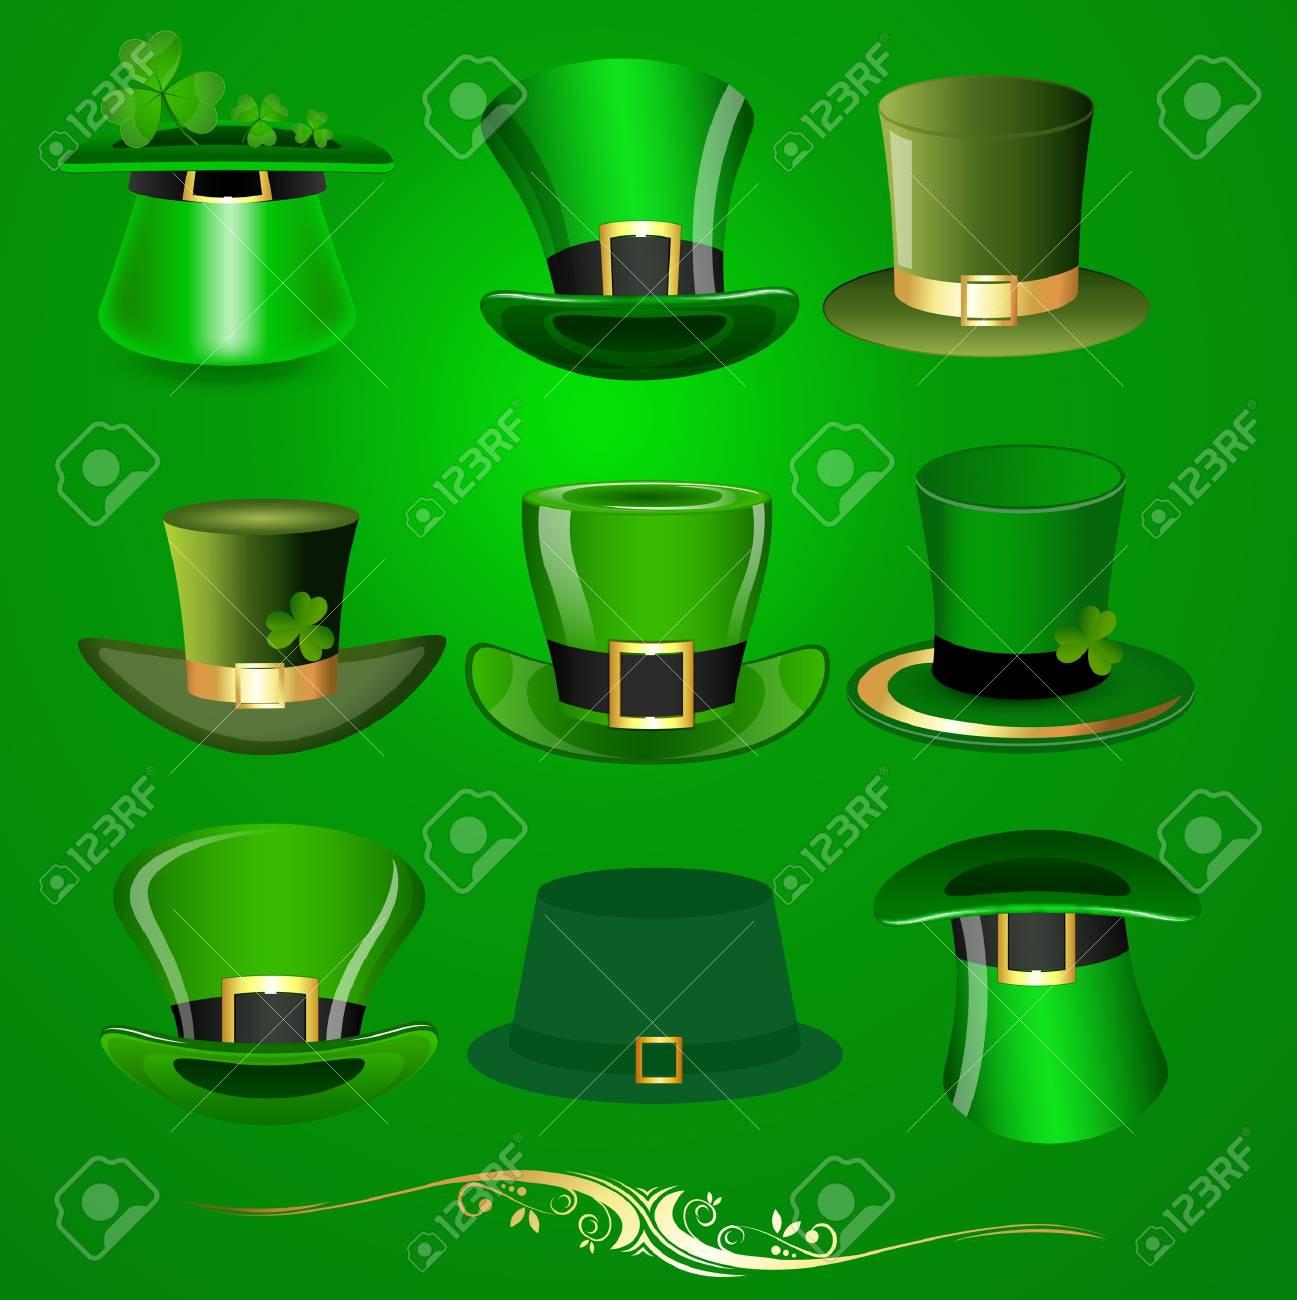 Patrick s Day Hats Vectors Stock Vector - 12859692